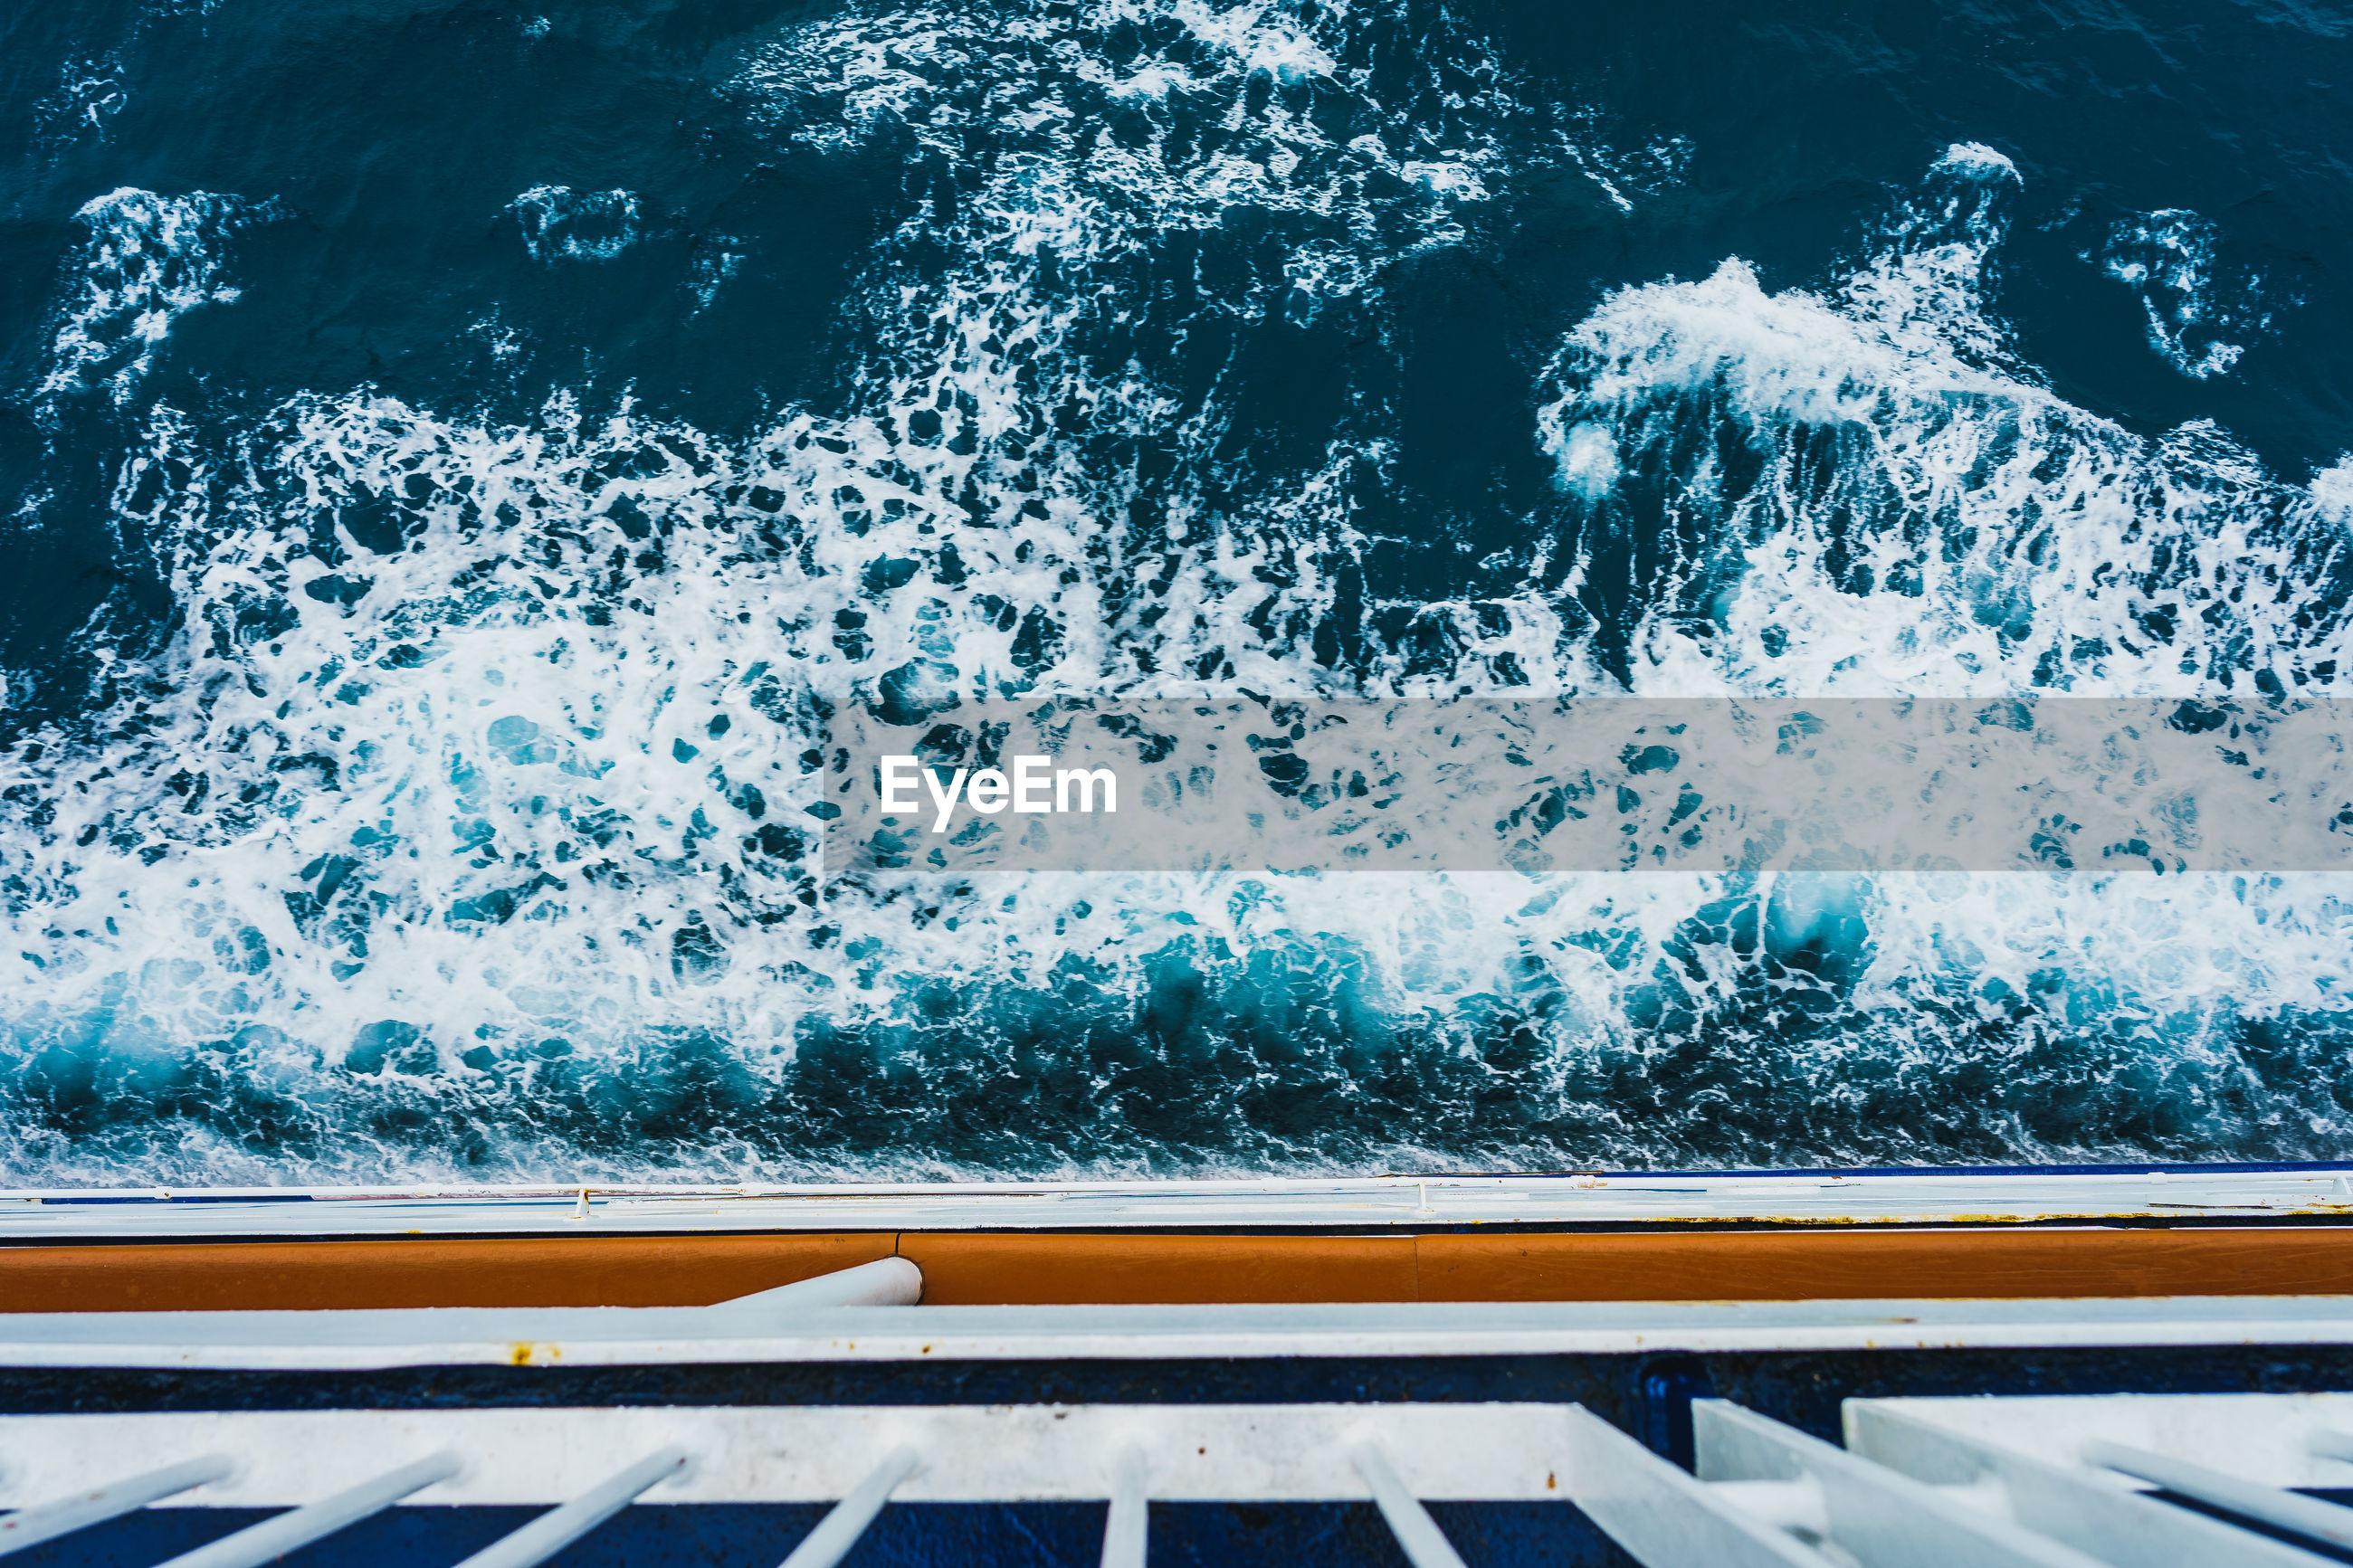 HIGH ANGLE VIEW OF SWIMMING POOL AT SEA